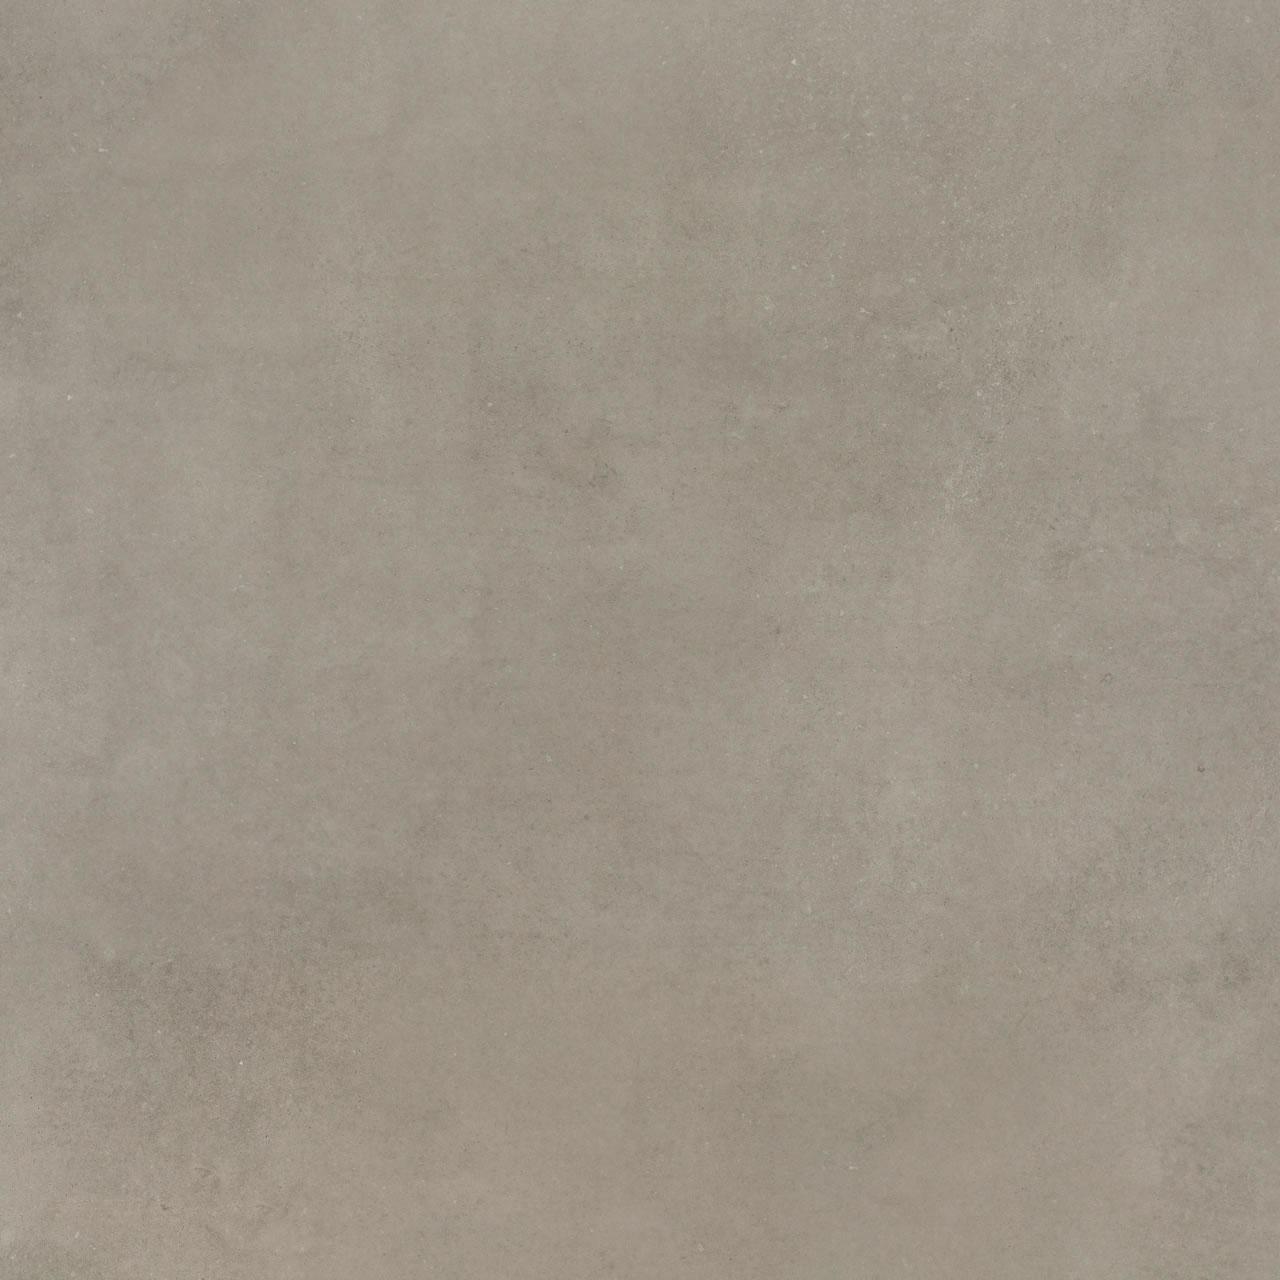 munari concreto ac